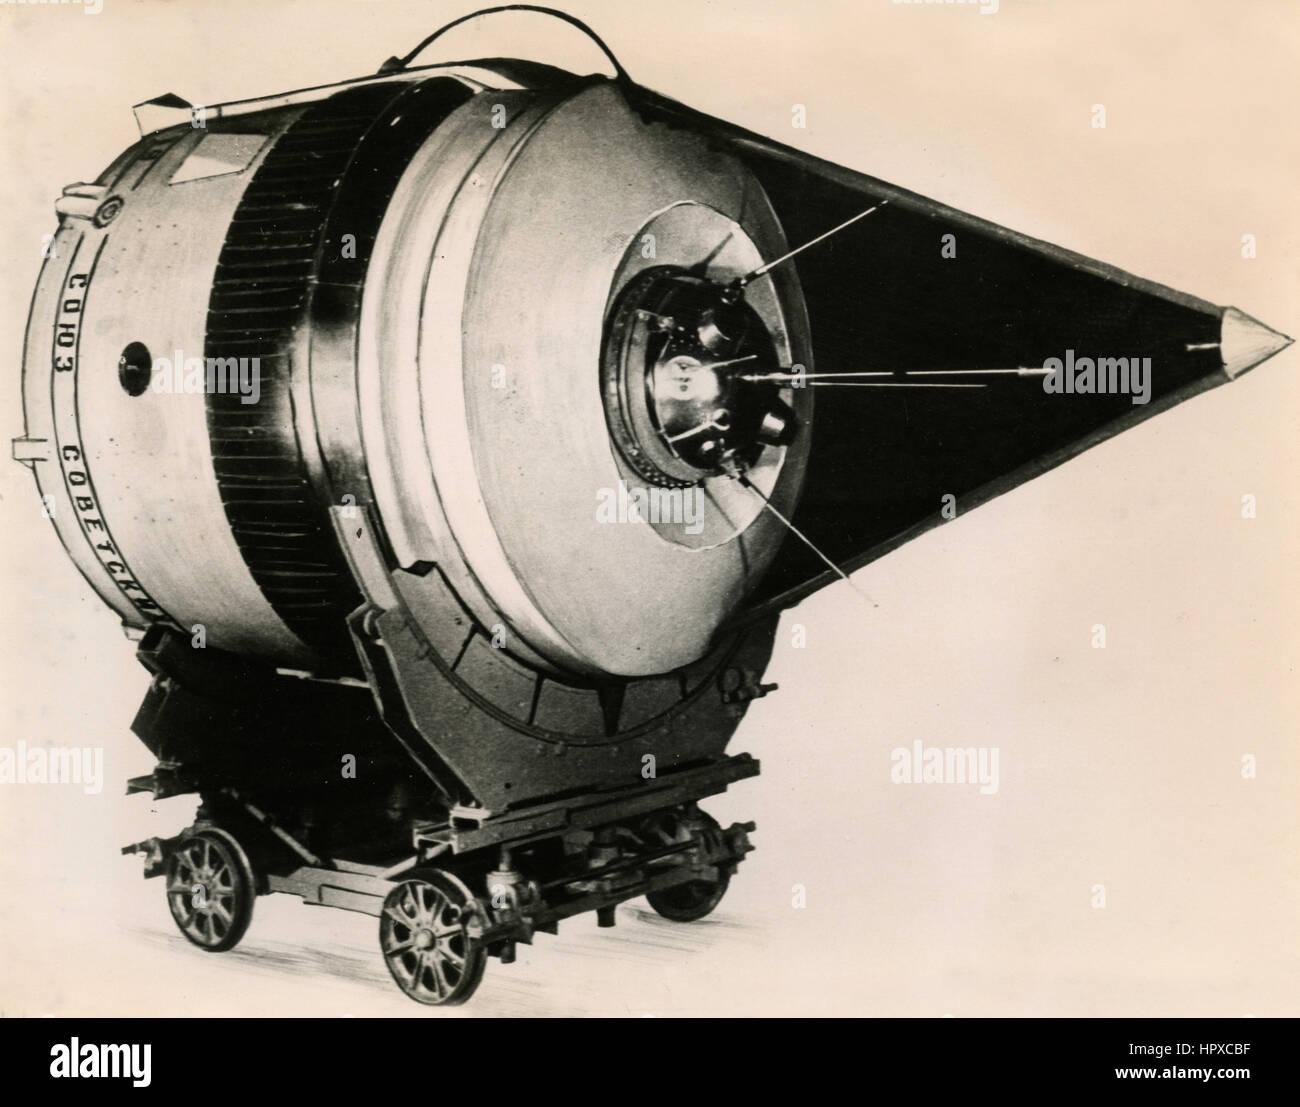 Last stage model of cosmic rocket, USSR 1959 - Stock Image